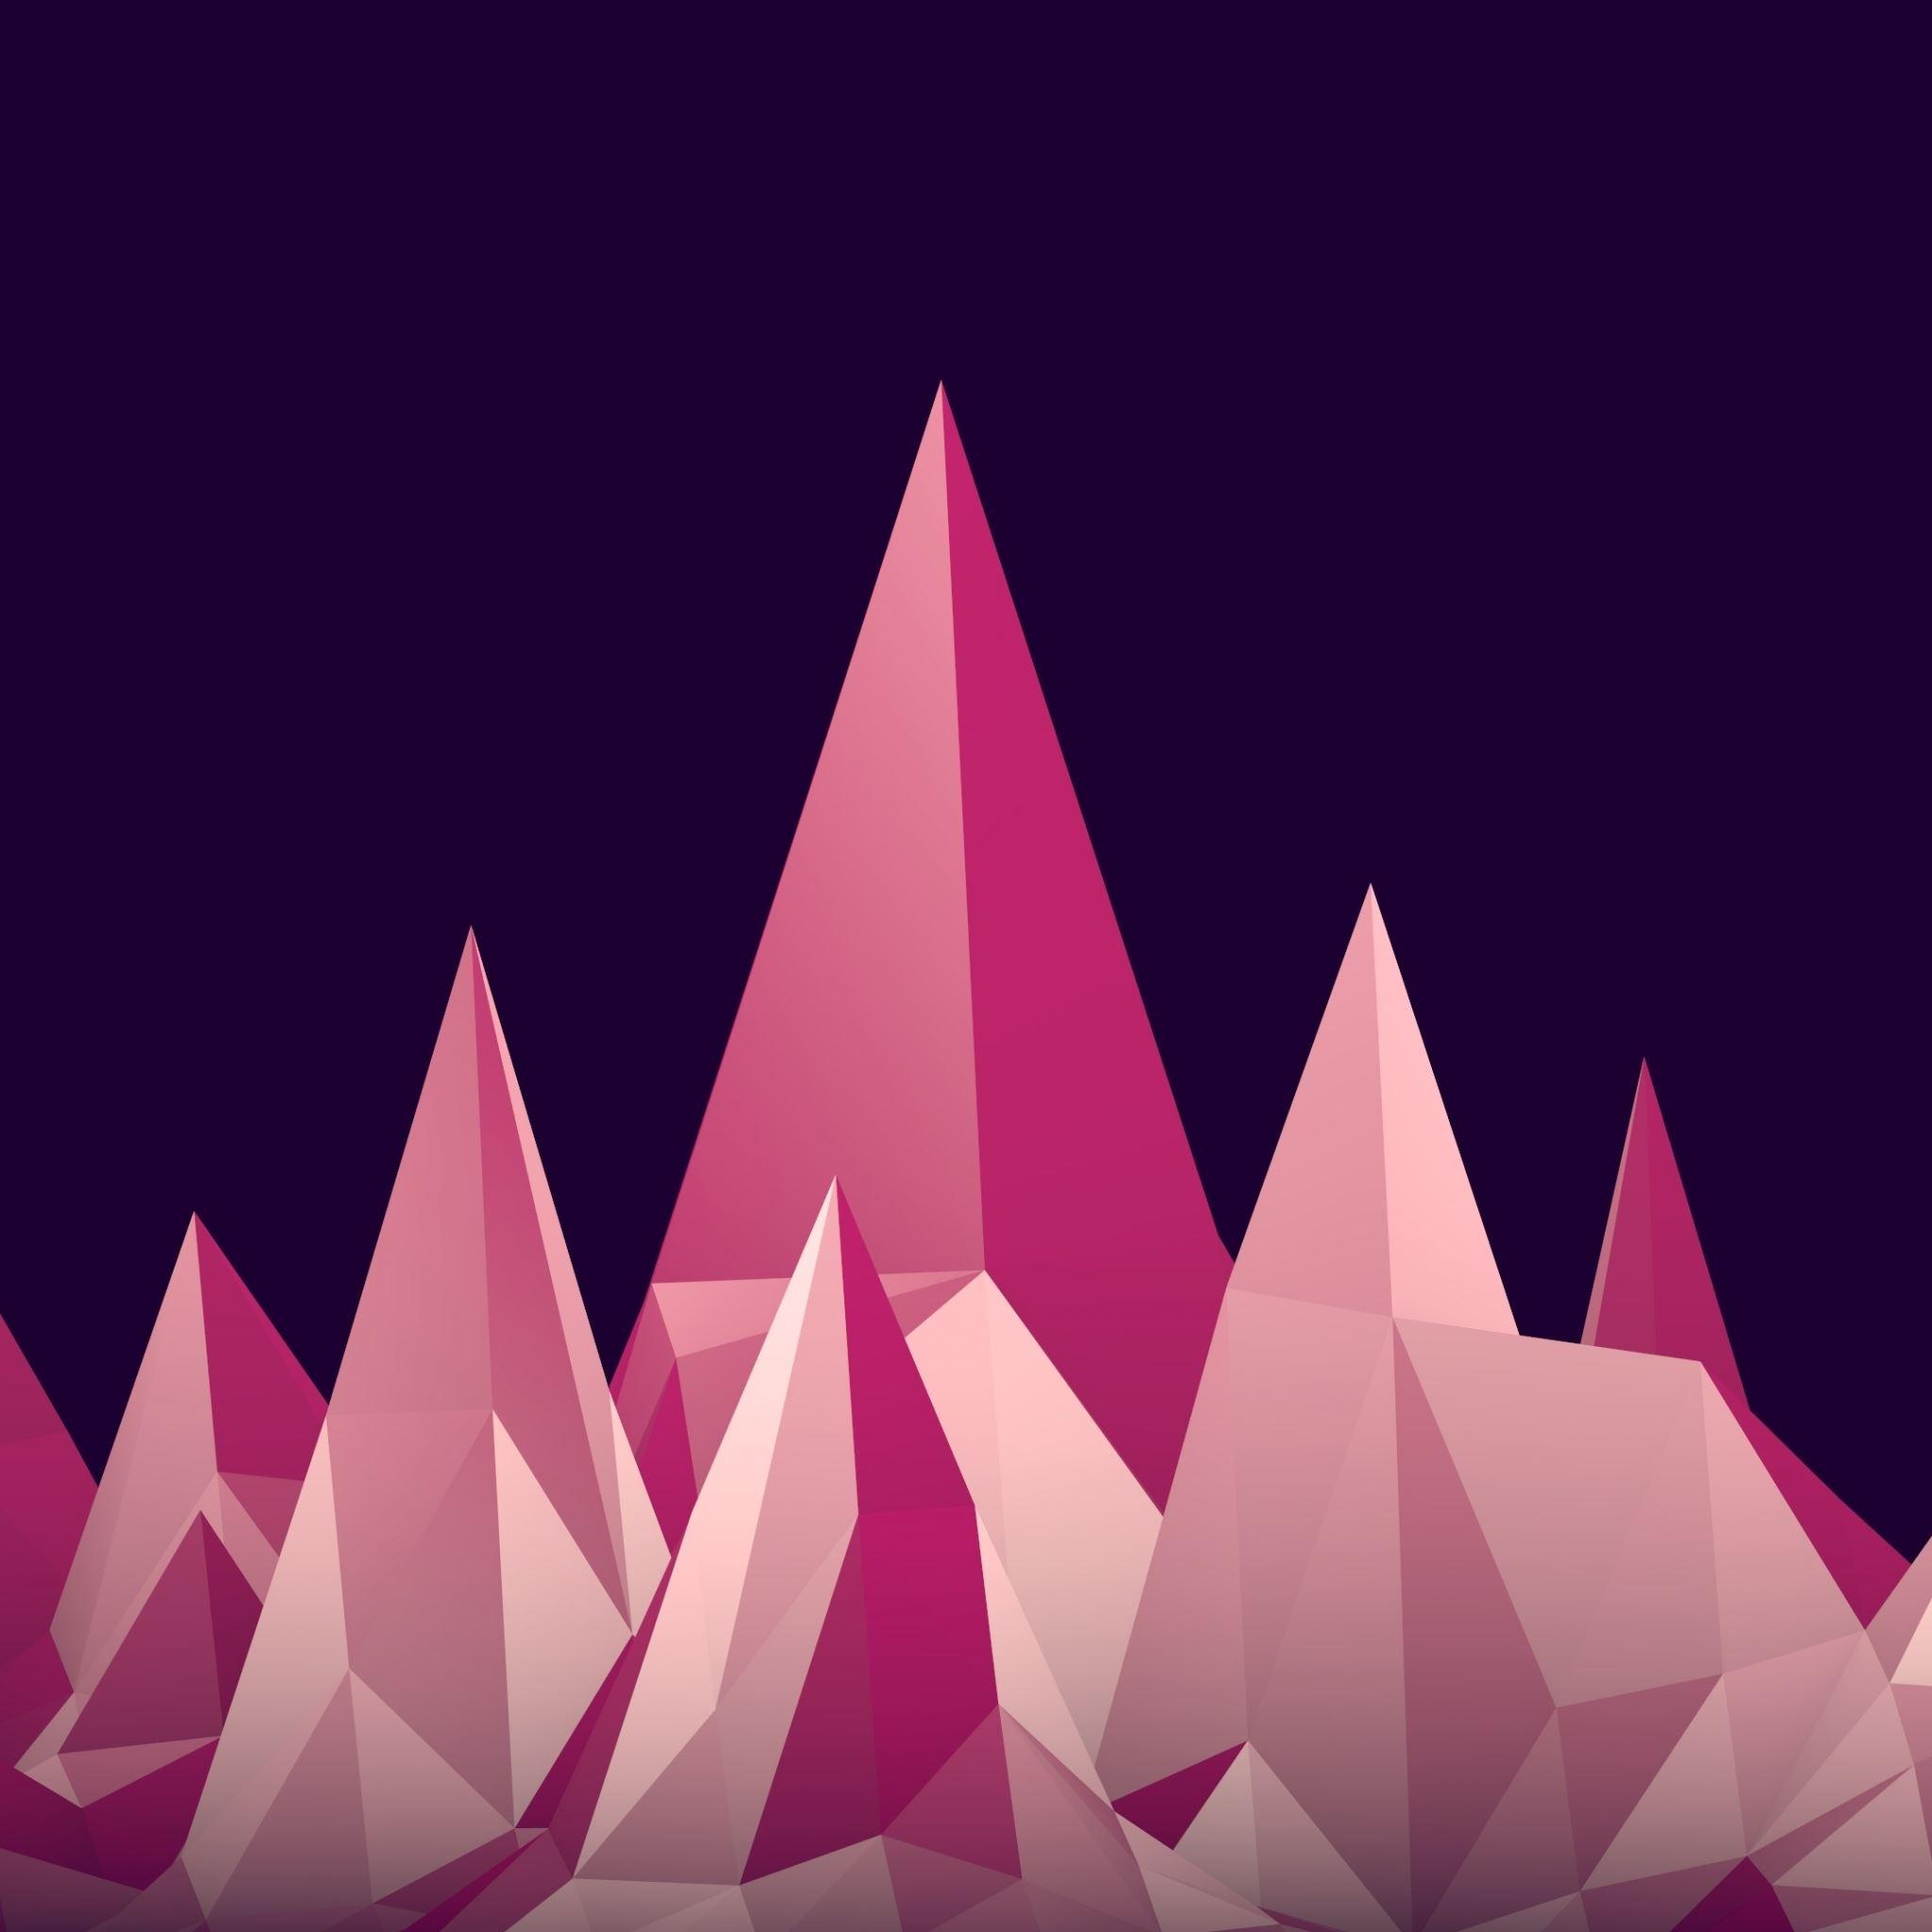 Graphics Low Poly Digital Art Minimalism Ipad Air Wallpapers